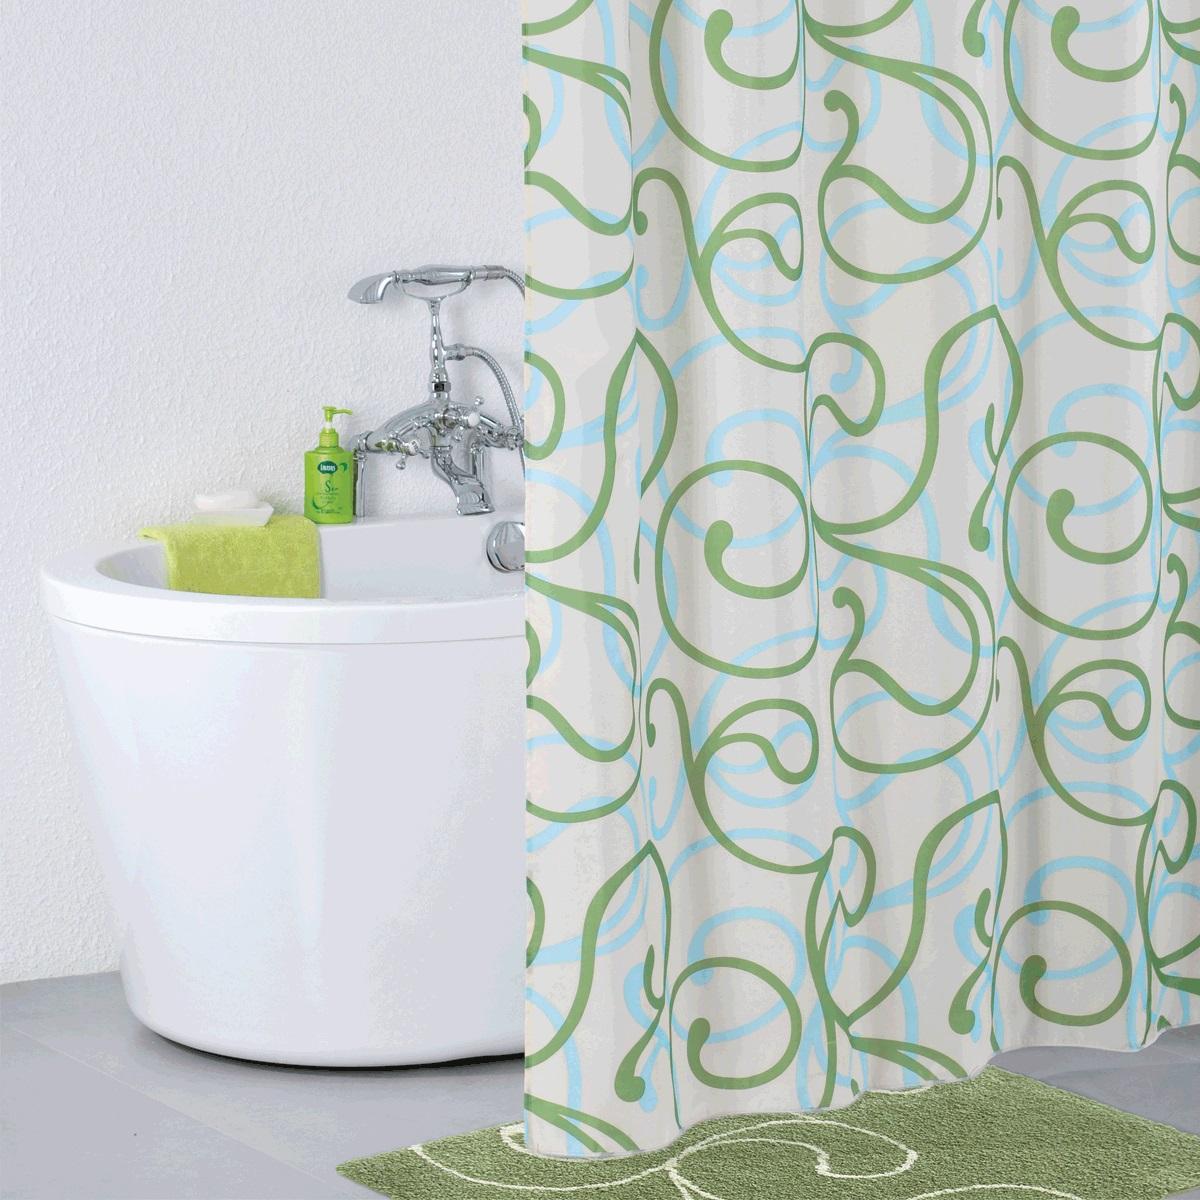 Штора для ванной Iddis Flower Lace Green, цвет: белый, зеленый, 200 x 200 см штора для ванной iddis blue butterfly цвет голубой 200 x 200 см